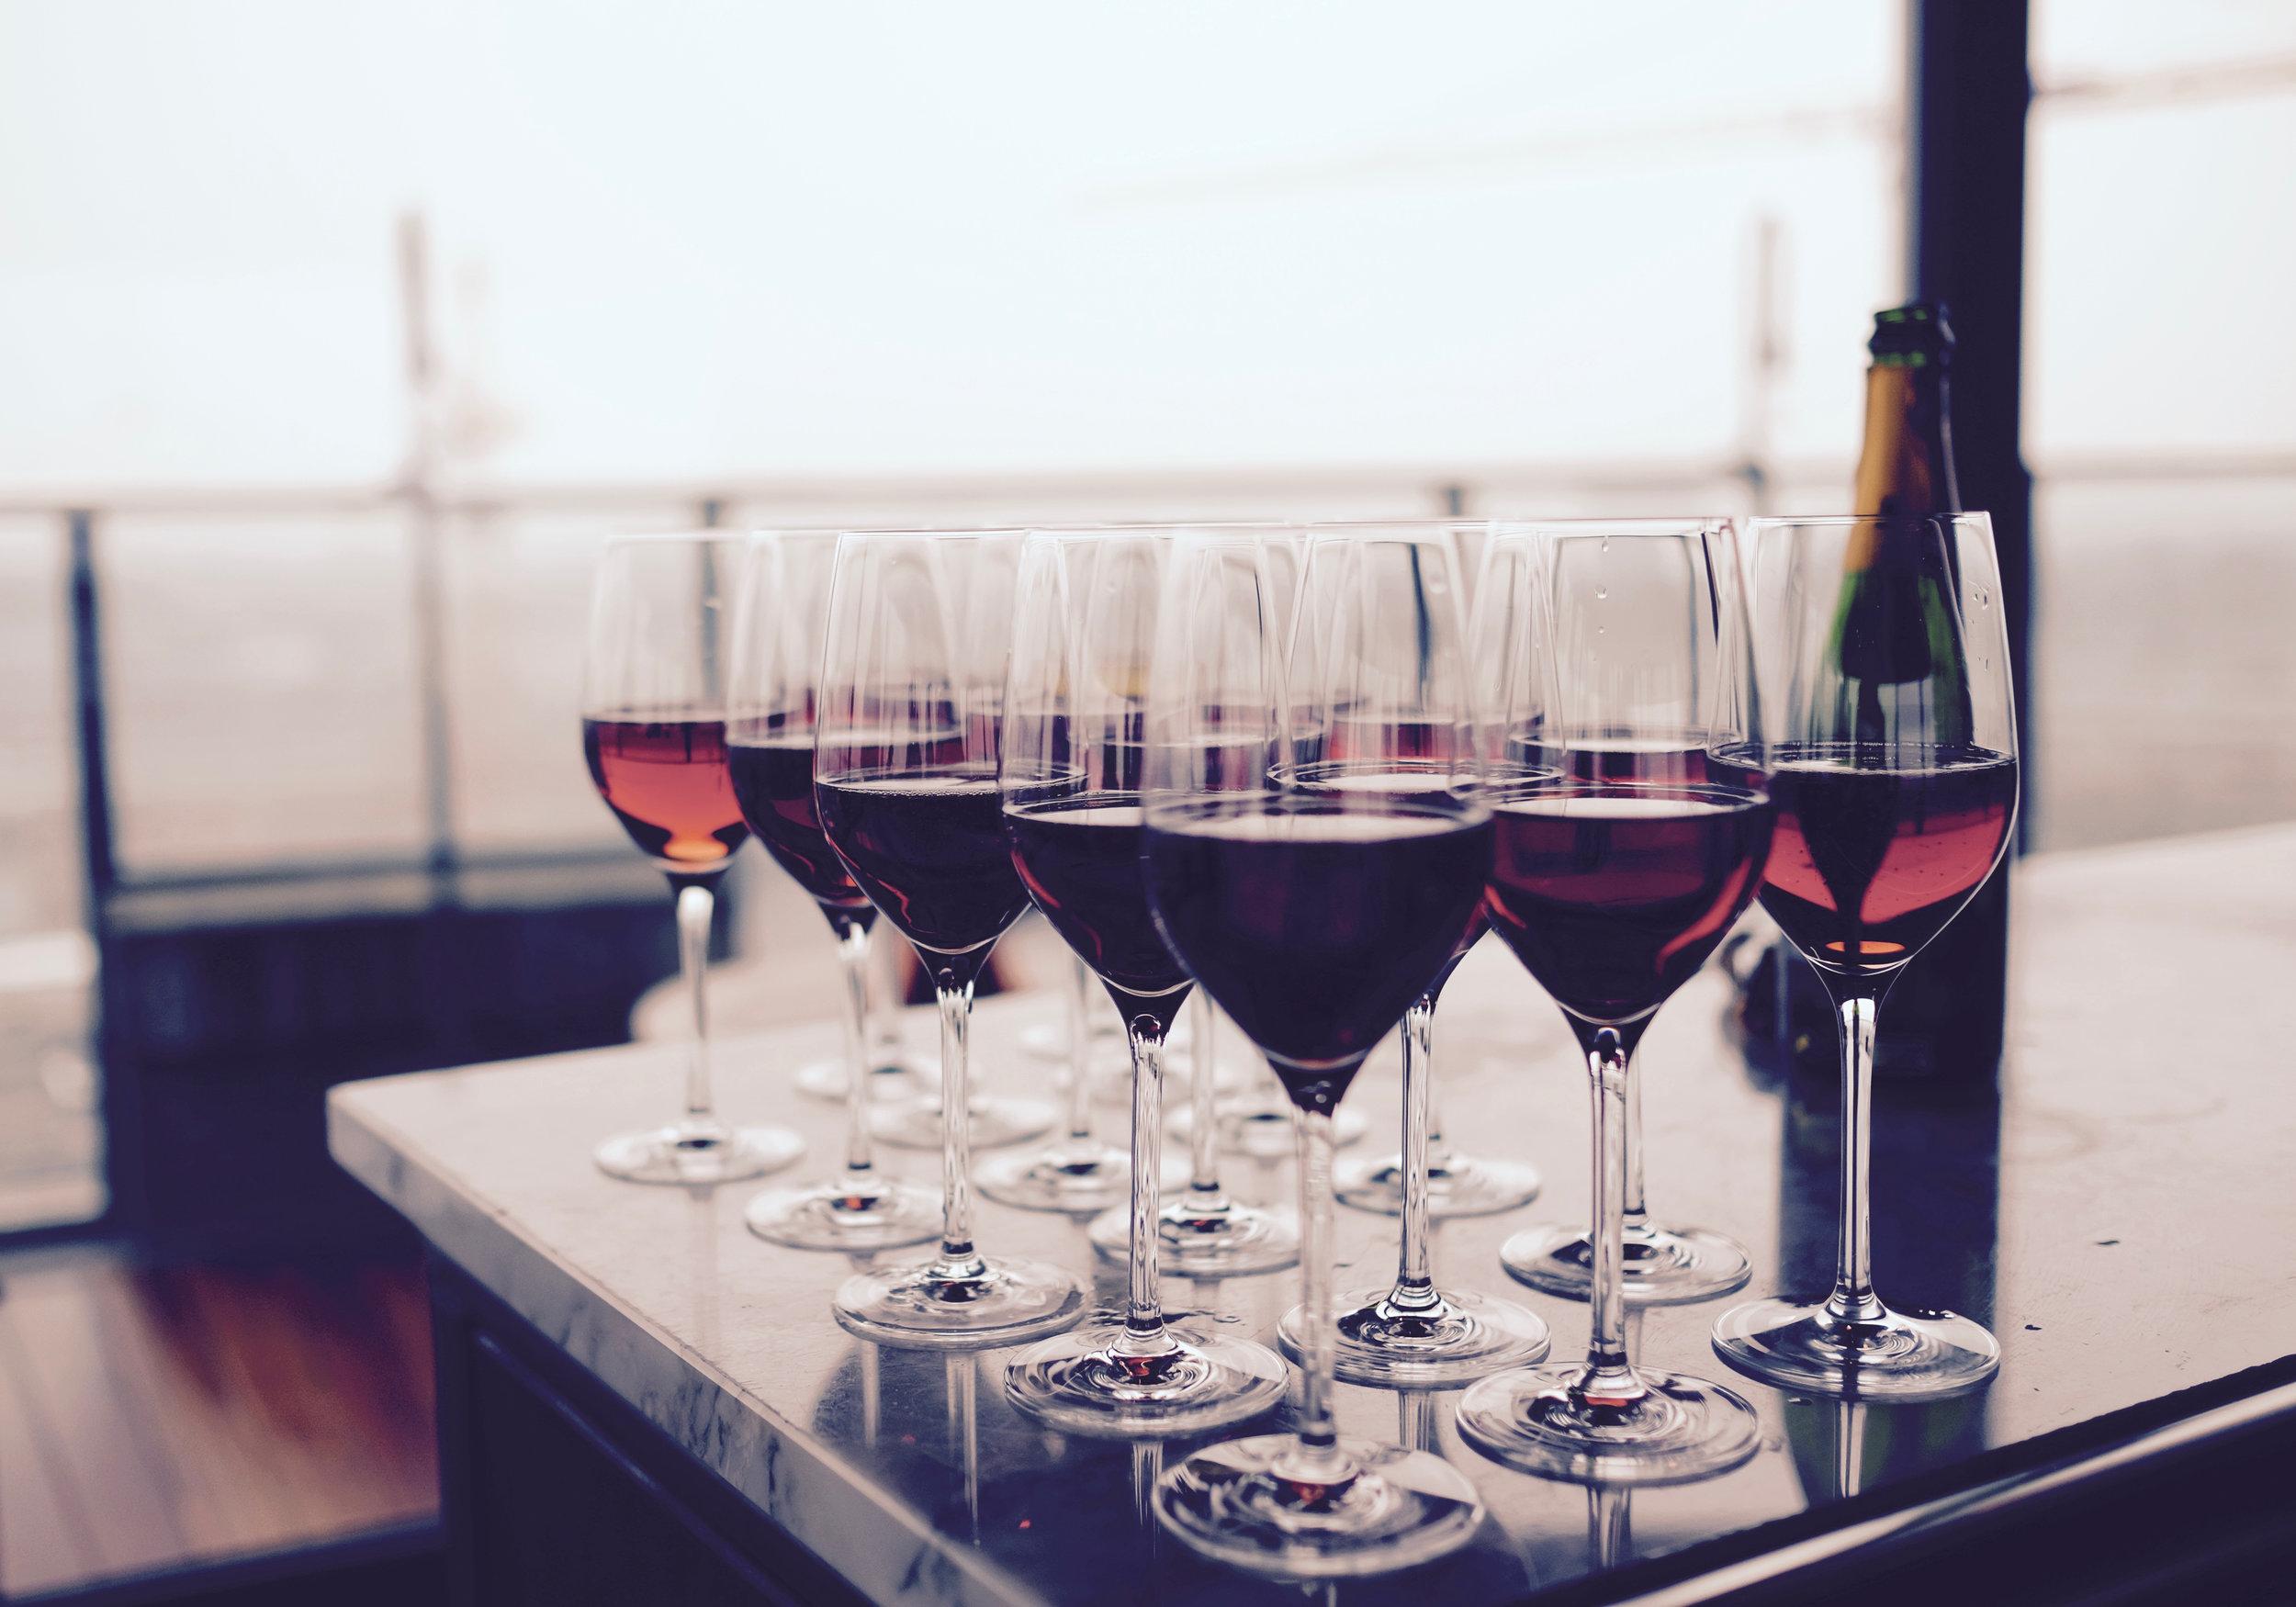 full red wine glasses pexels-photo-66636.jpeg